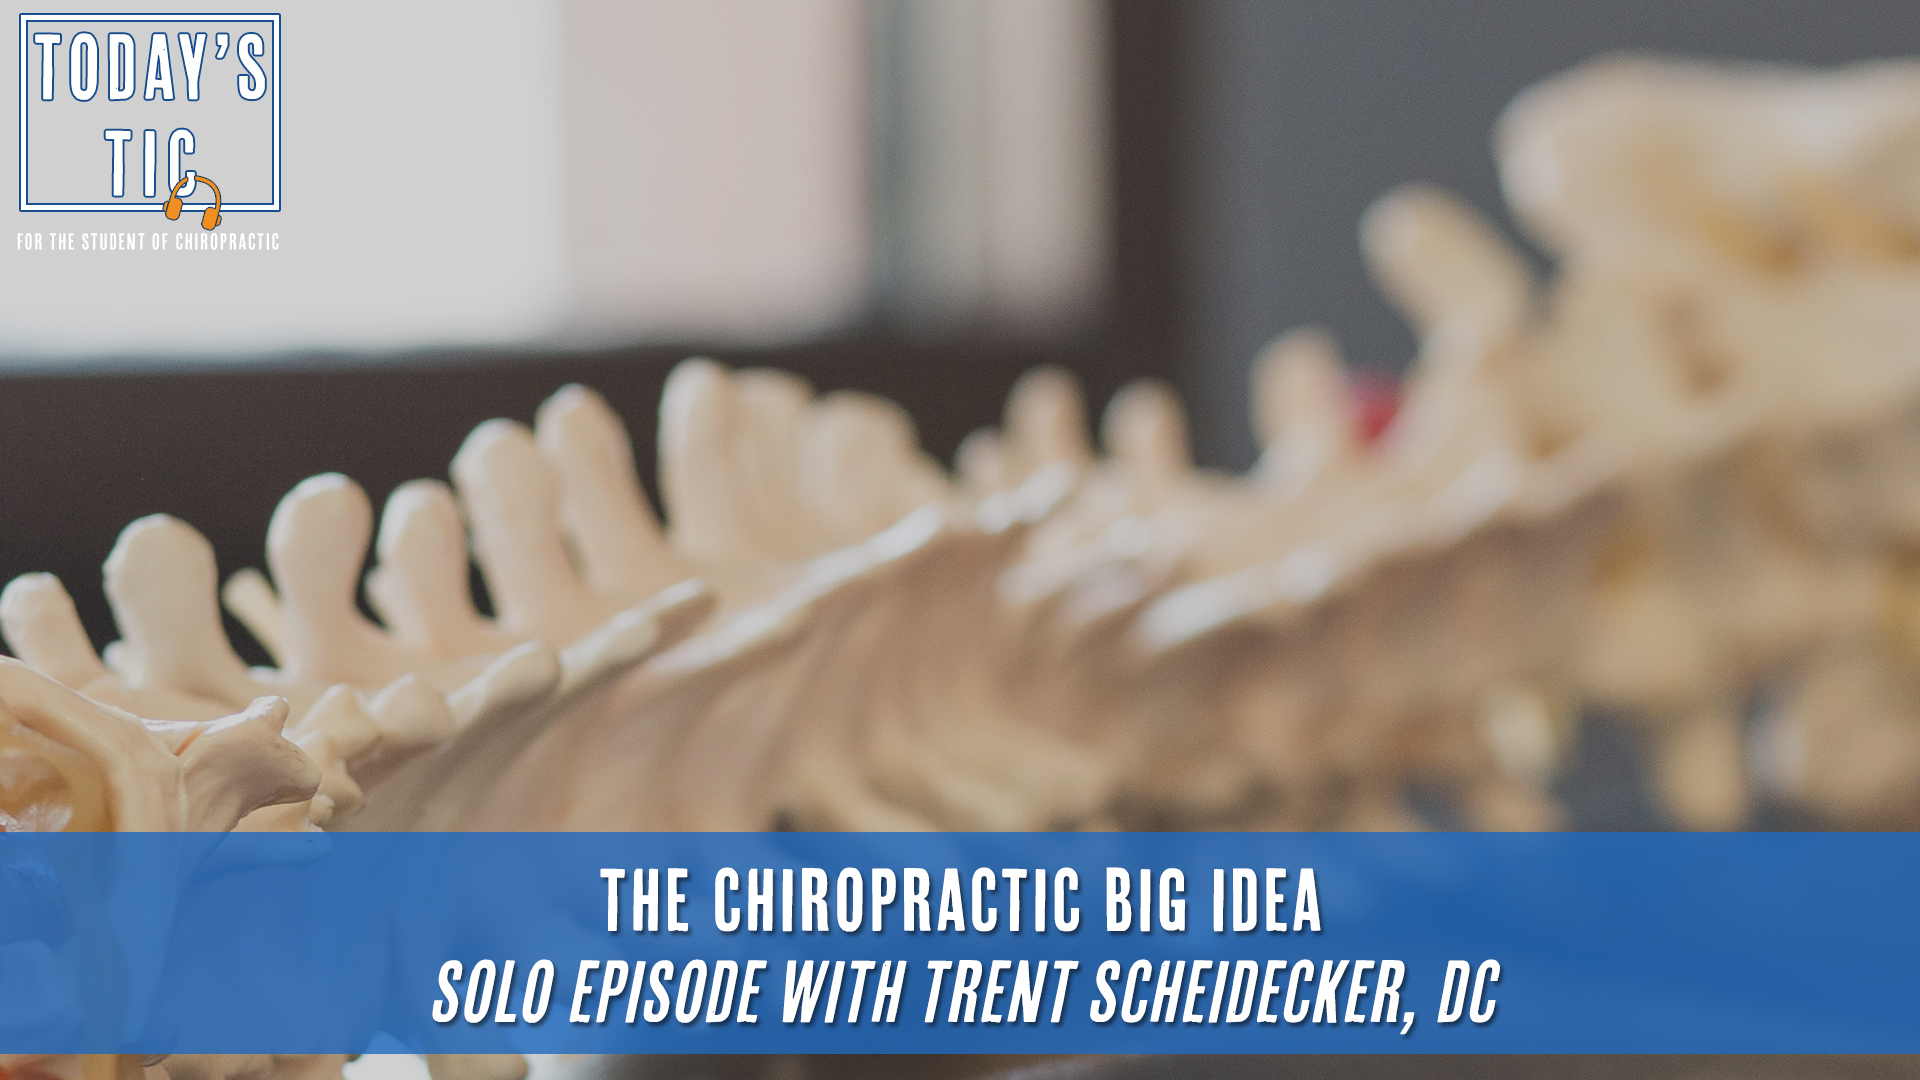 The Chiropractic Big Idea